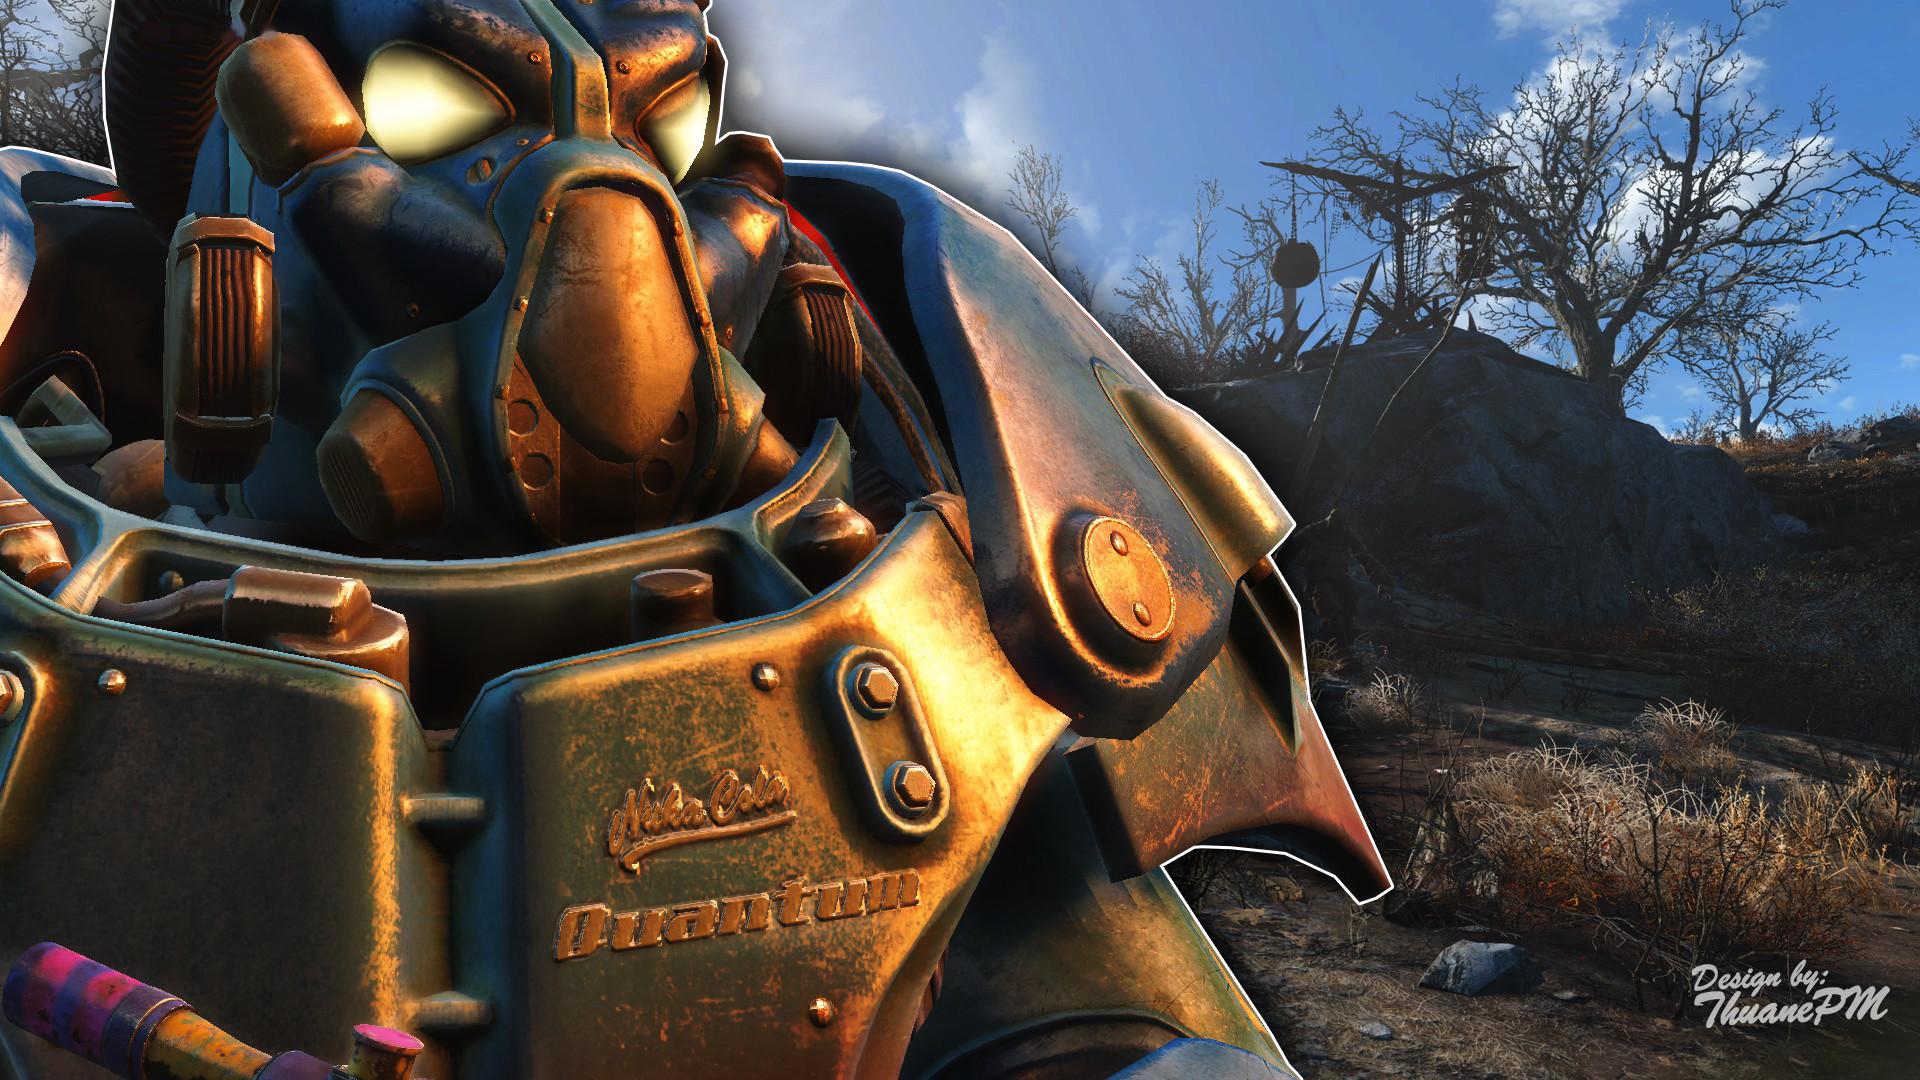 … Fallout 4 Wallpaper – Nuka-Cola Quantum PowerArmor by ThuanePM